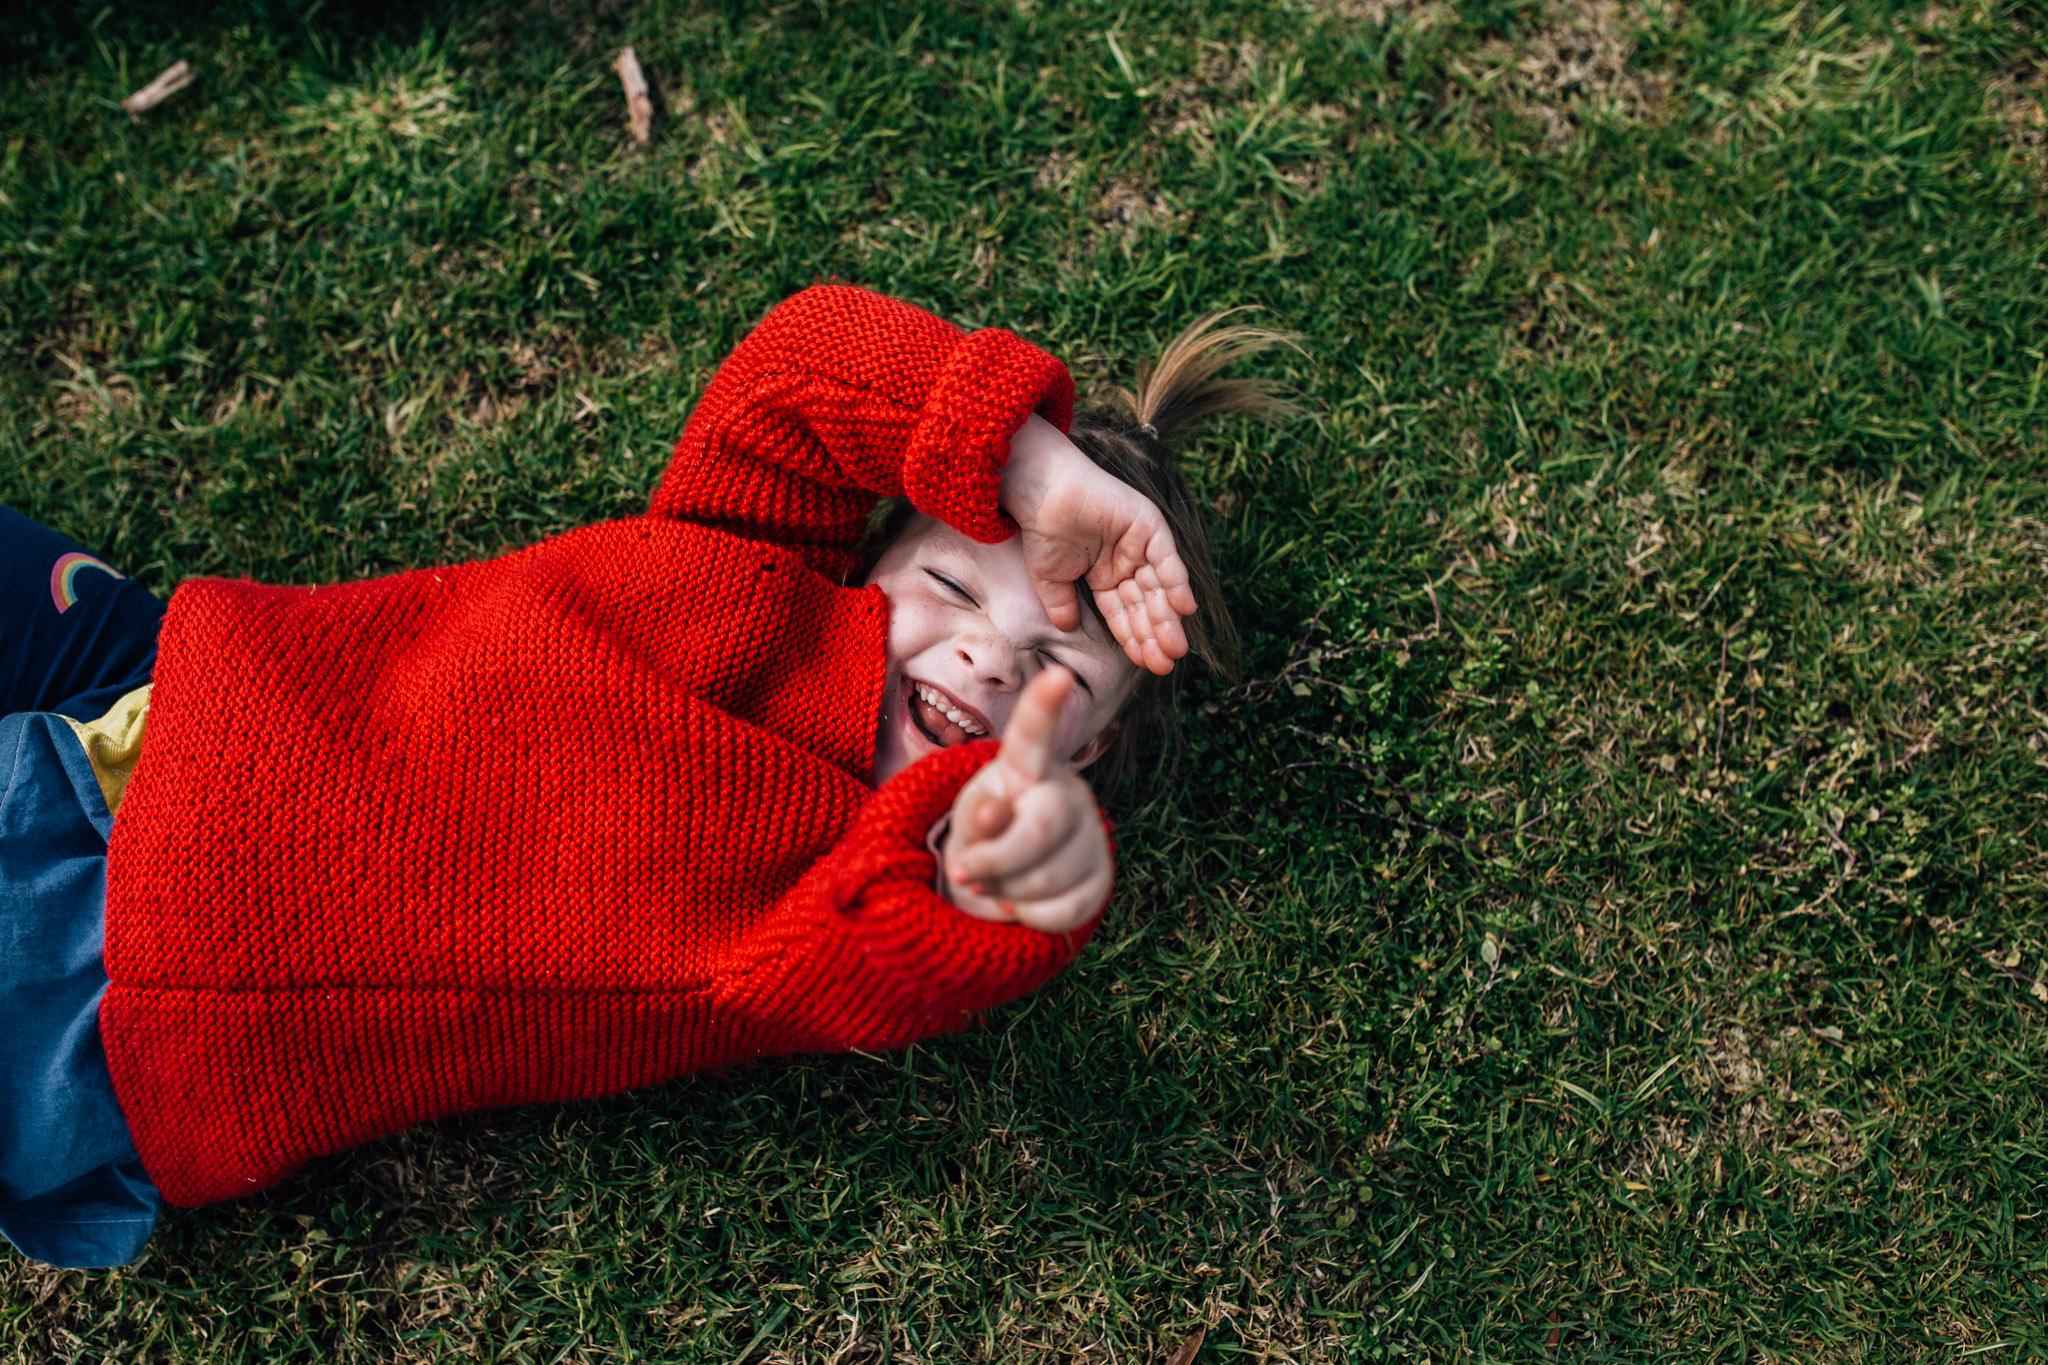 little girl in red cardigan lying in grass (1 of 1).jpg